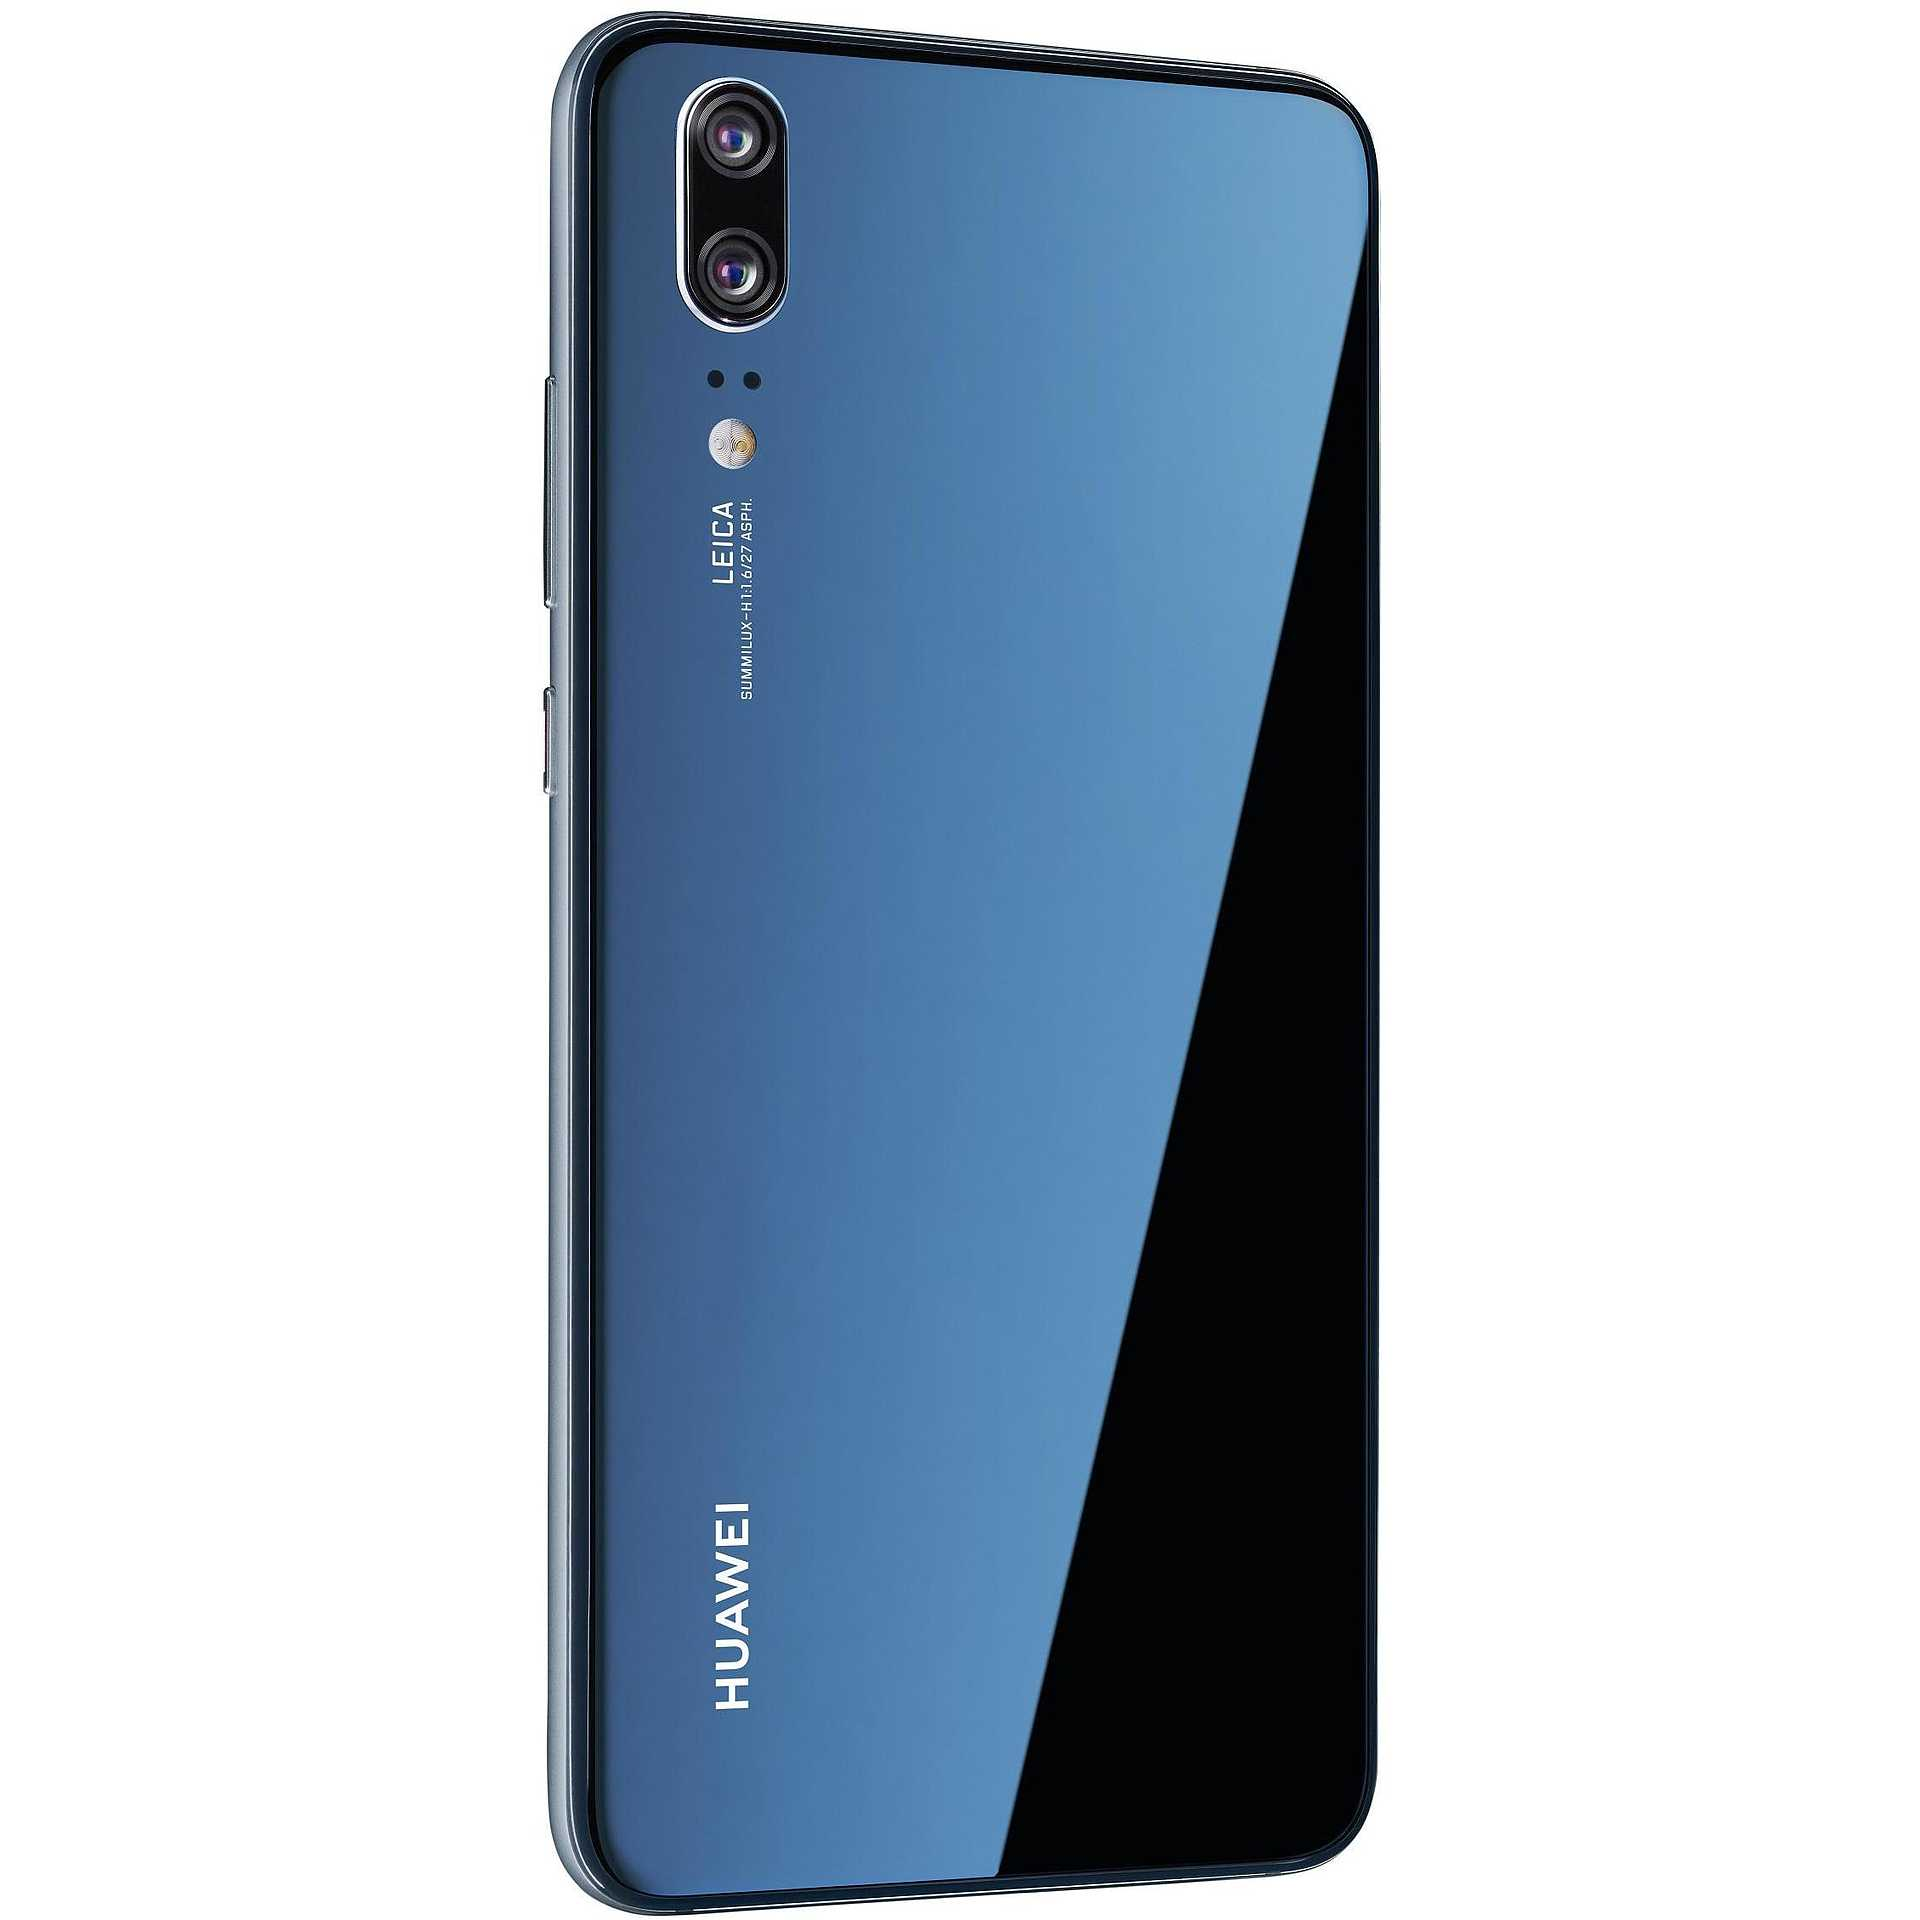 Huawei P20 Smartphone 58 Memoria 128GB Ram 4GB Android